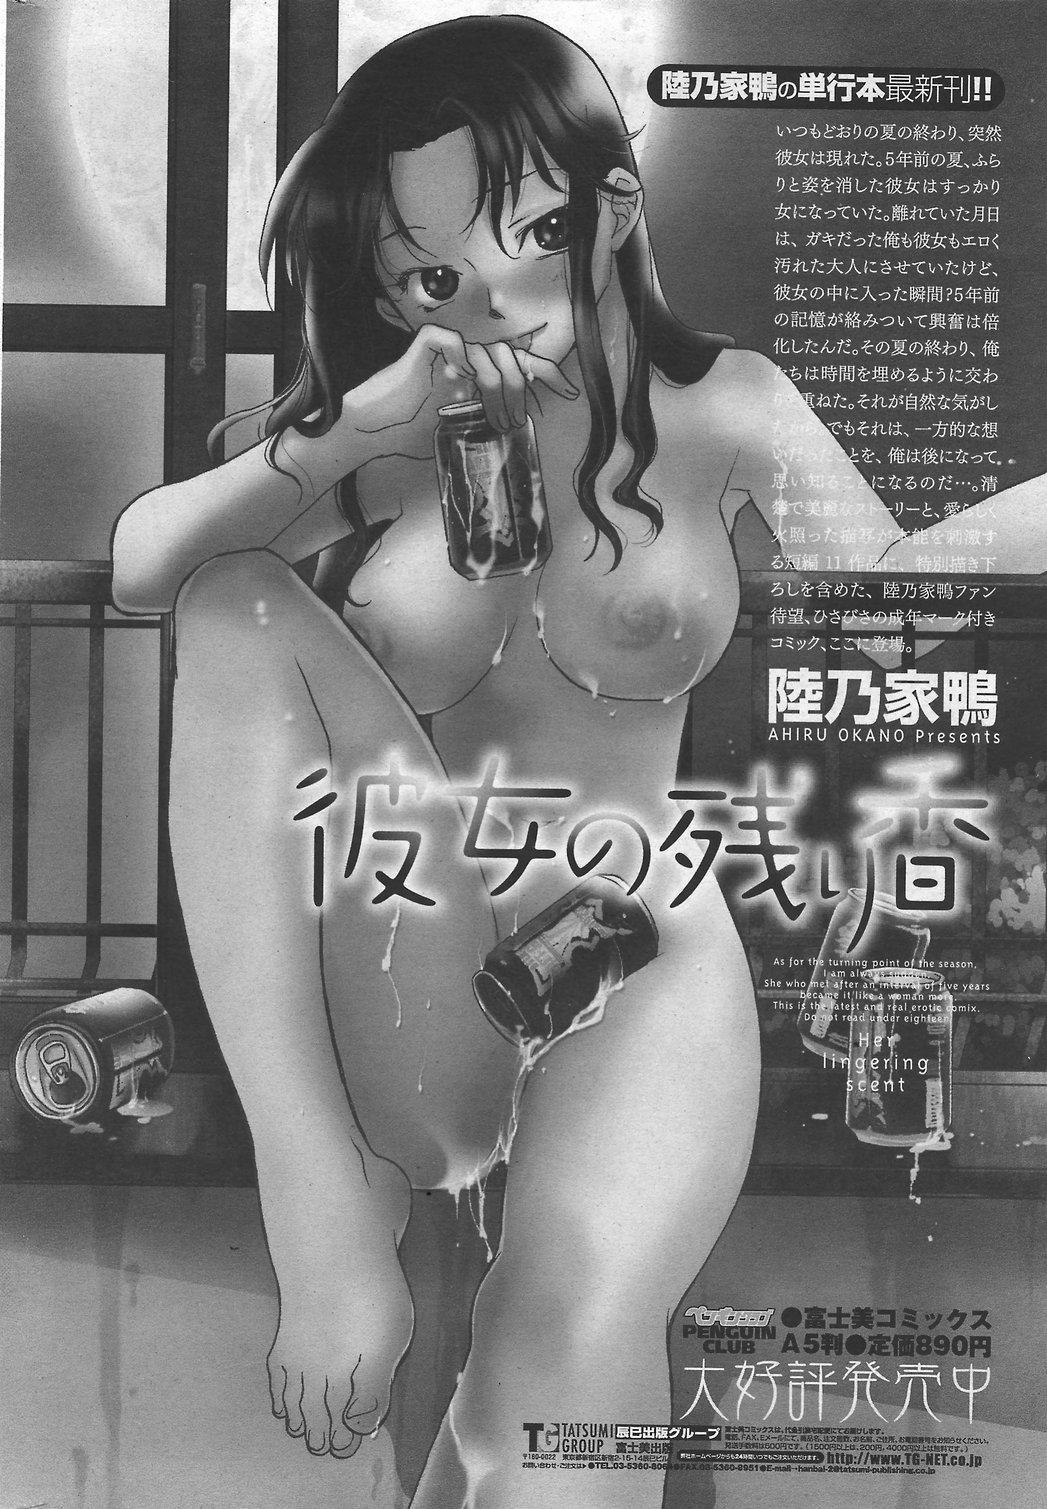 COMIC Penguin Club Sanzokuban 2007-10 Vol. 225 19